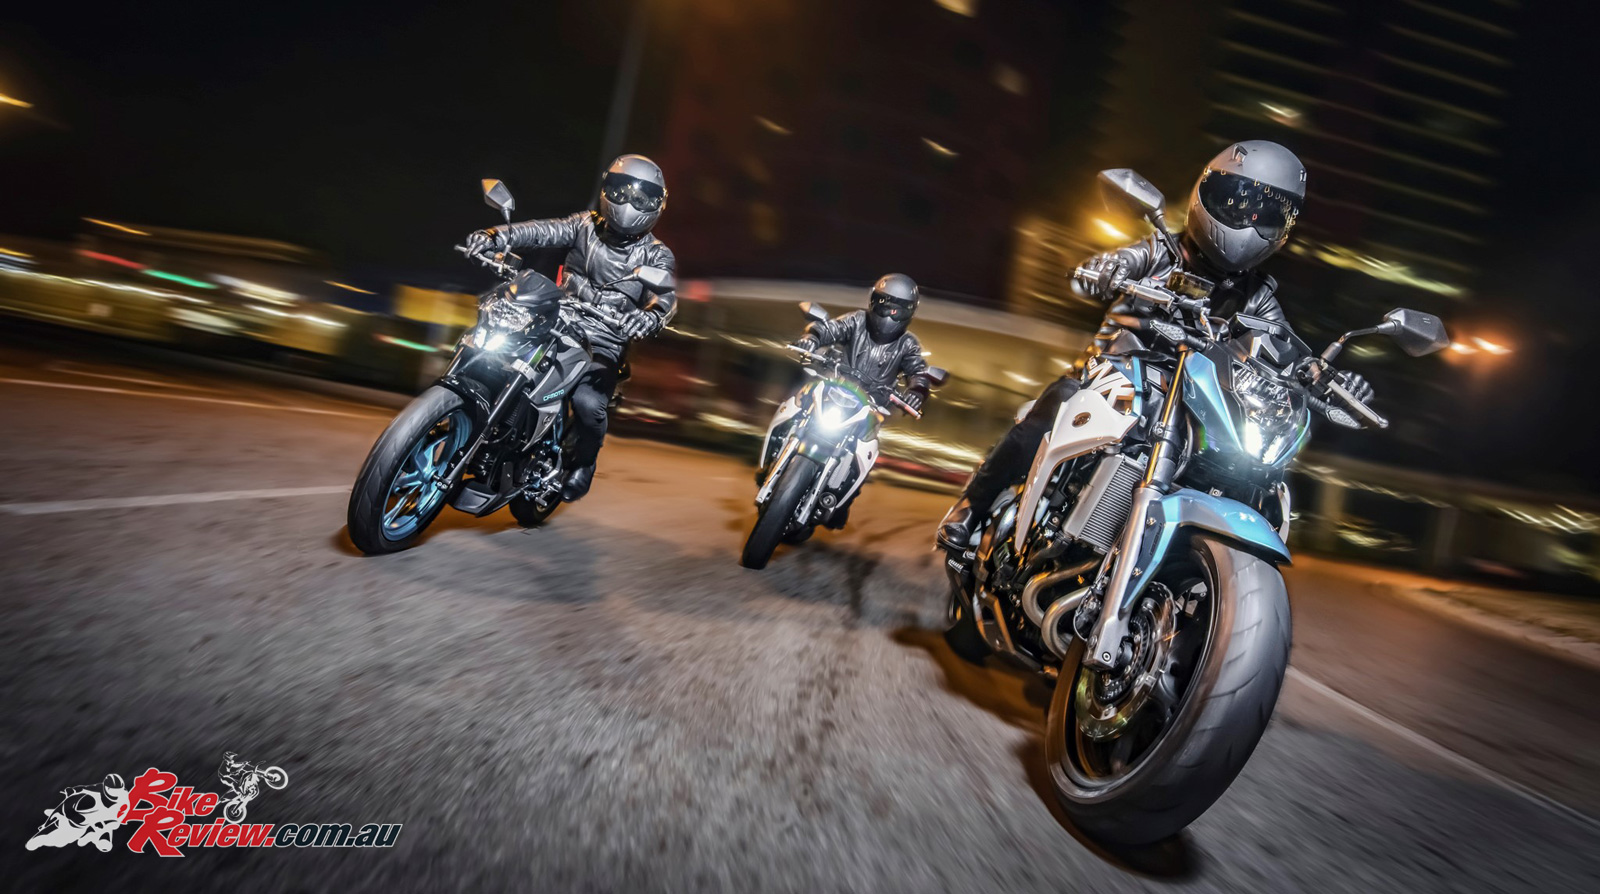 Video Review: 2020 CFMoto 650GT ABS Sports Tourer - Bike